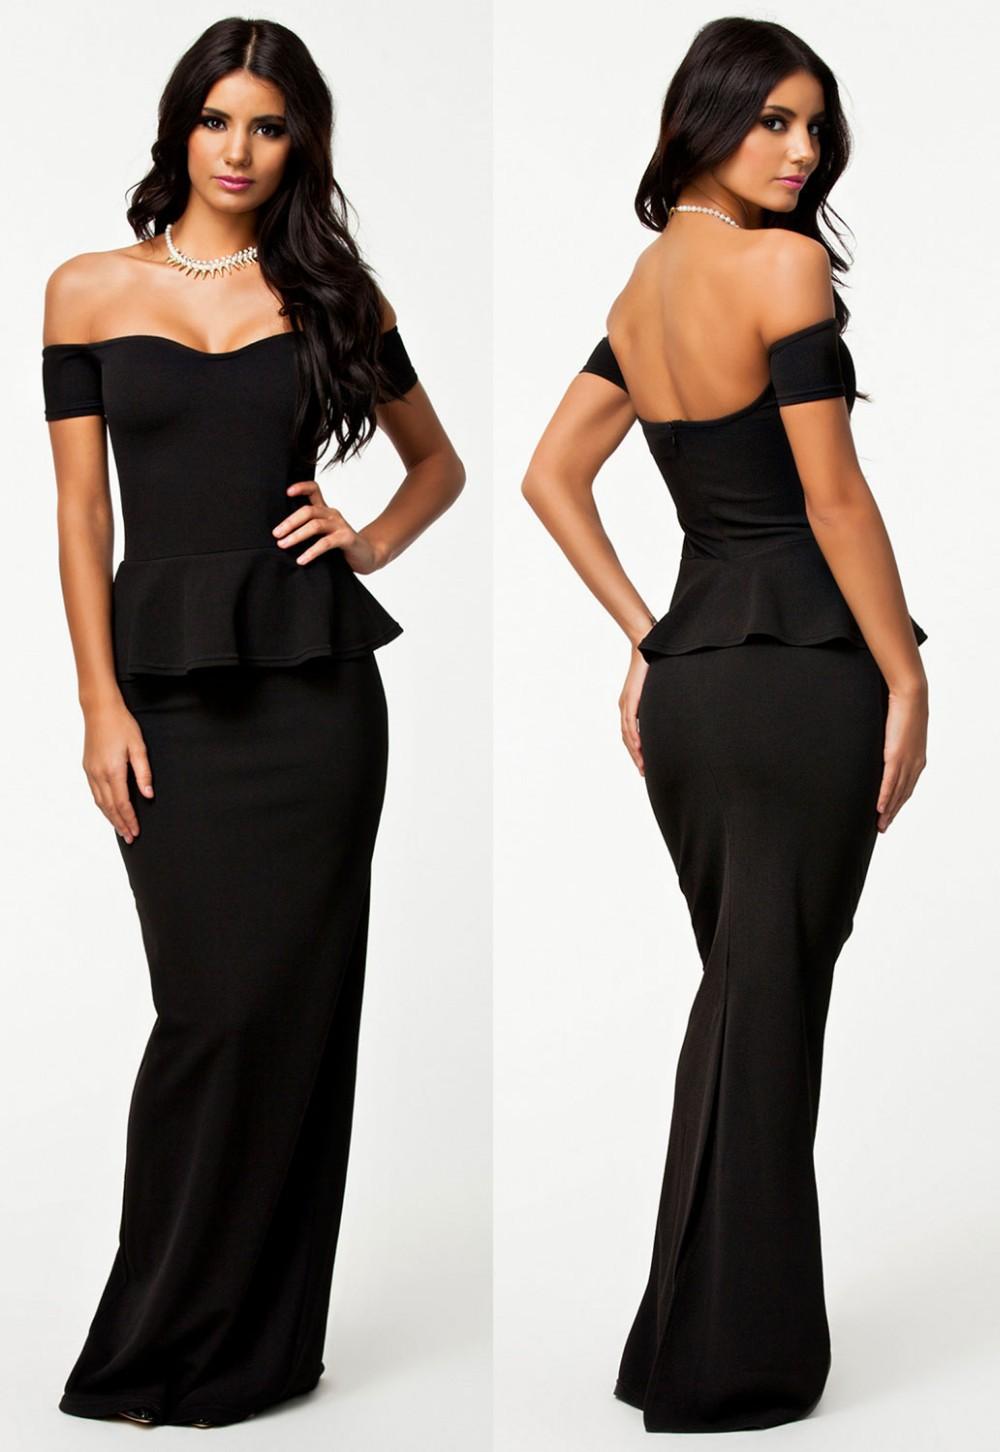 Black-Peplum-Maxi-Dress-With-Drop-shoulder-LC6244